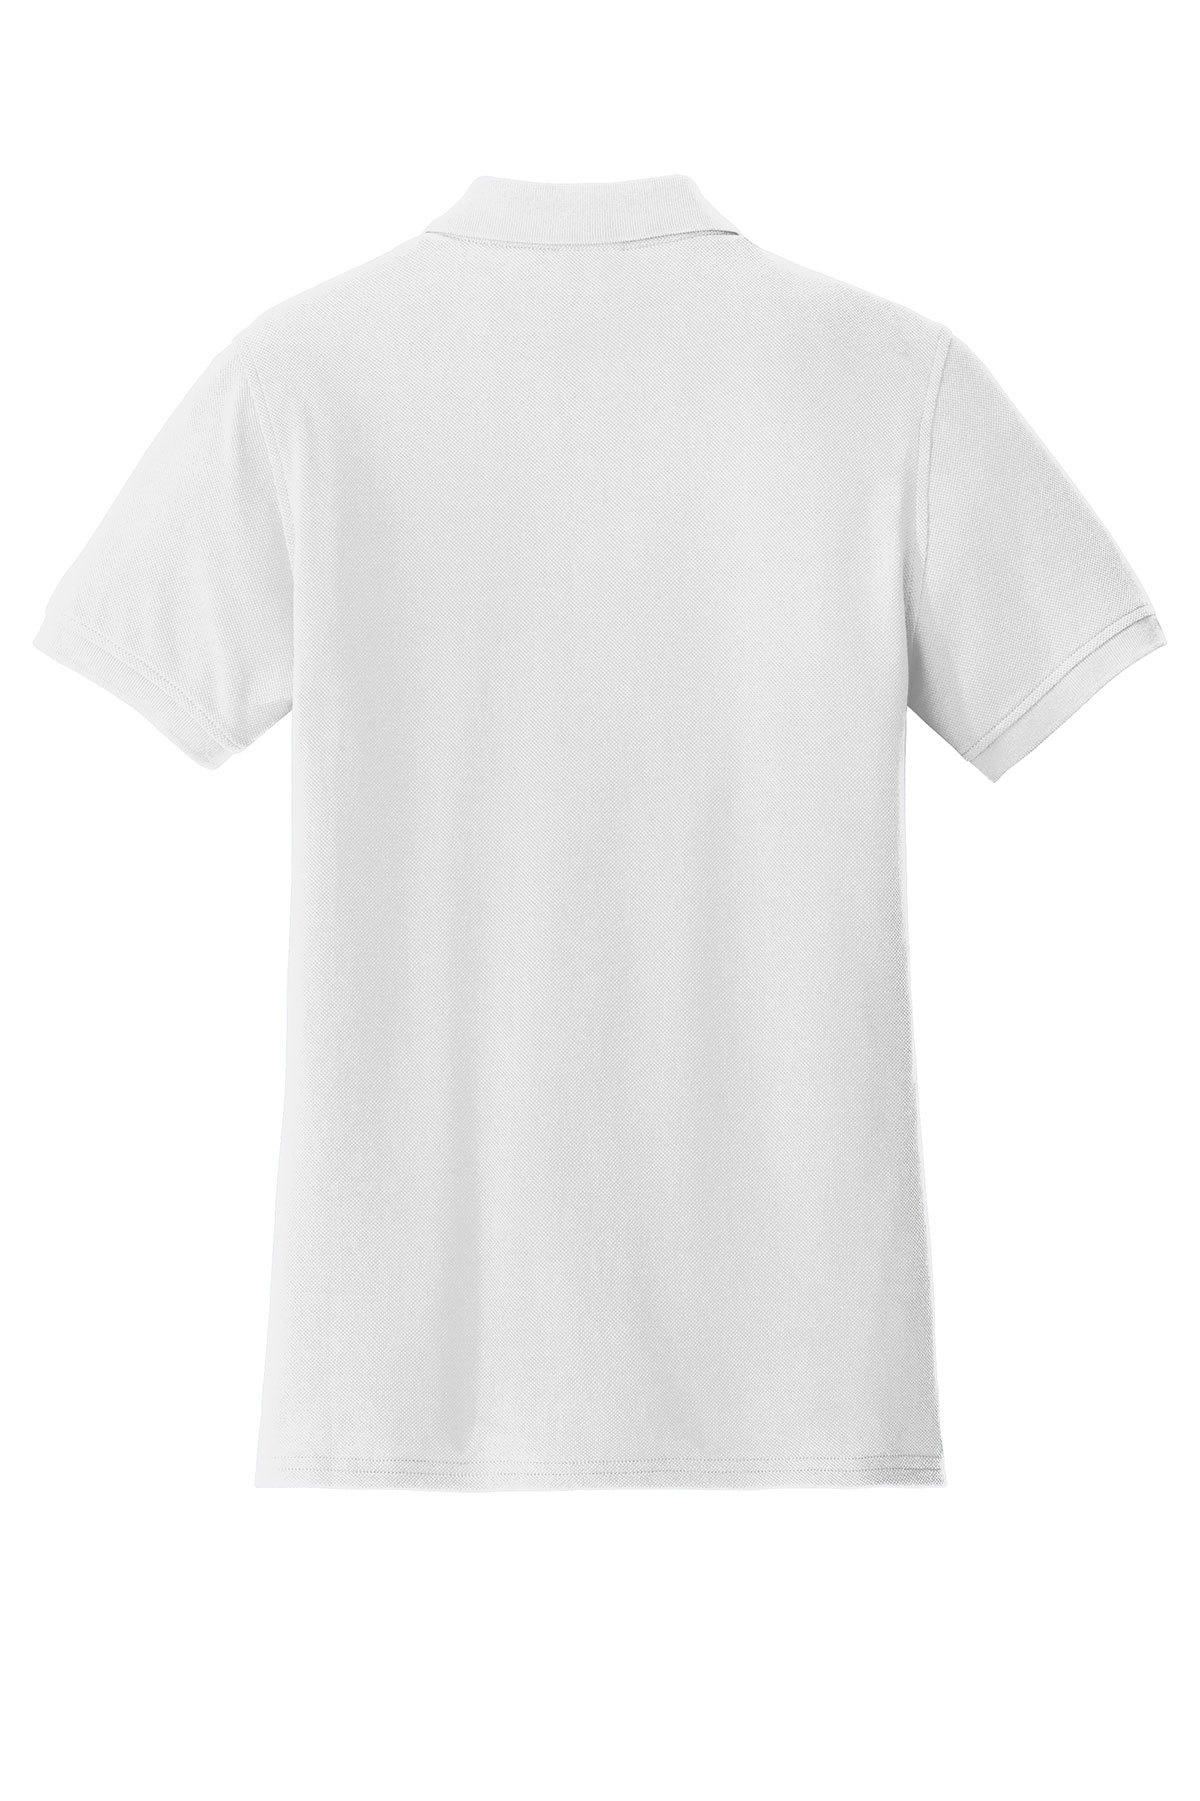 3dRose EvaDane Choose Grace Black T-Shirts Inspirational Sayings